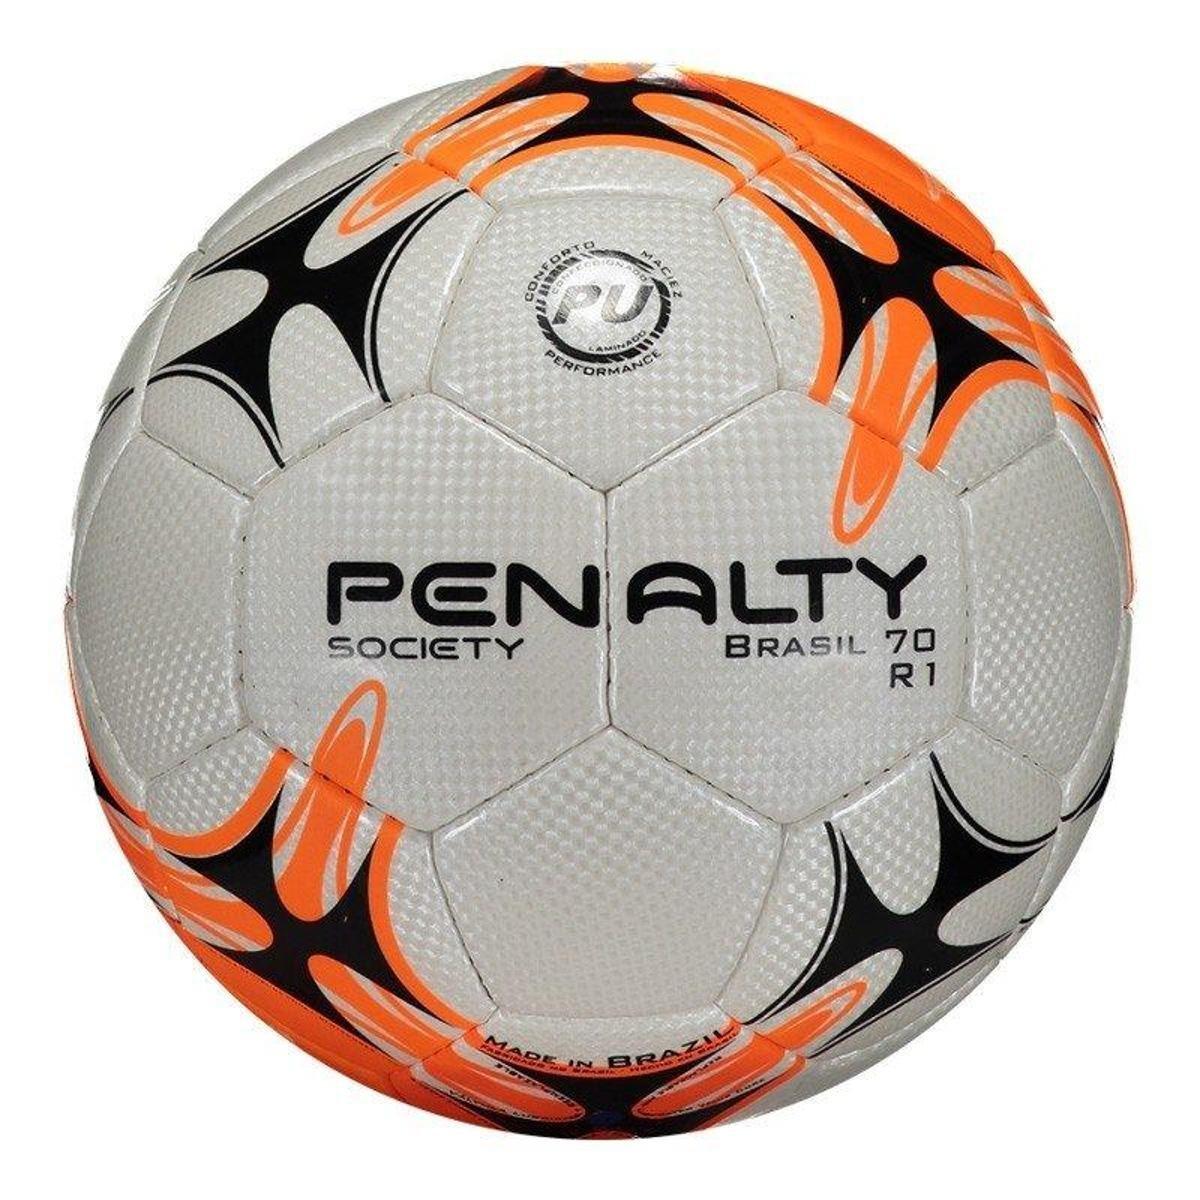 940fce3d3618a Bola Penalty Brasil 70 R1 VII Society - Branco e Laranja - Compre Agora